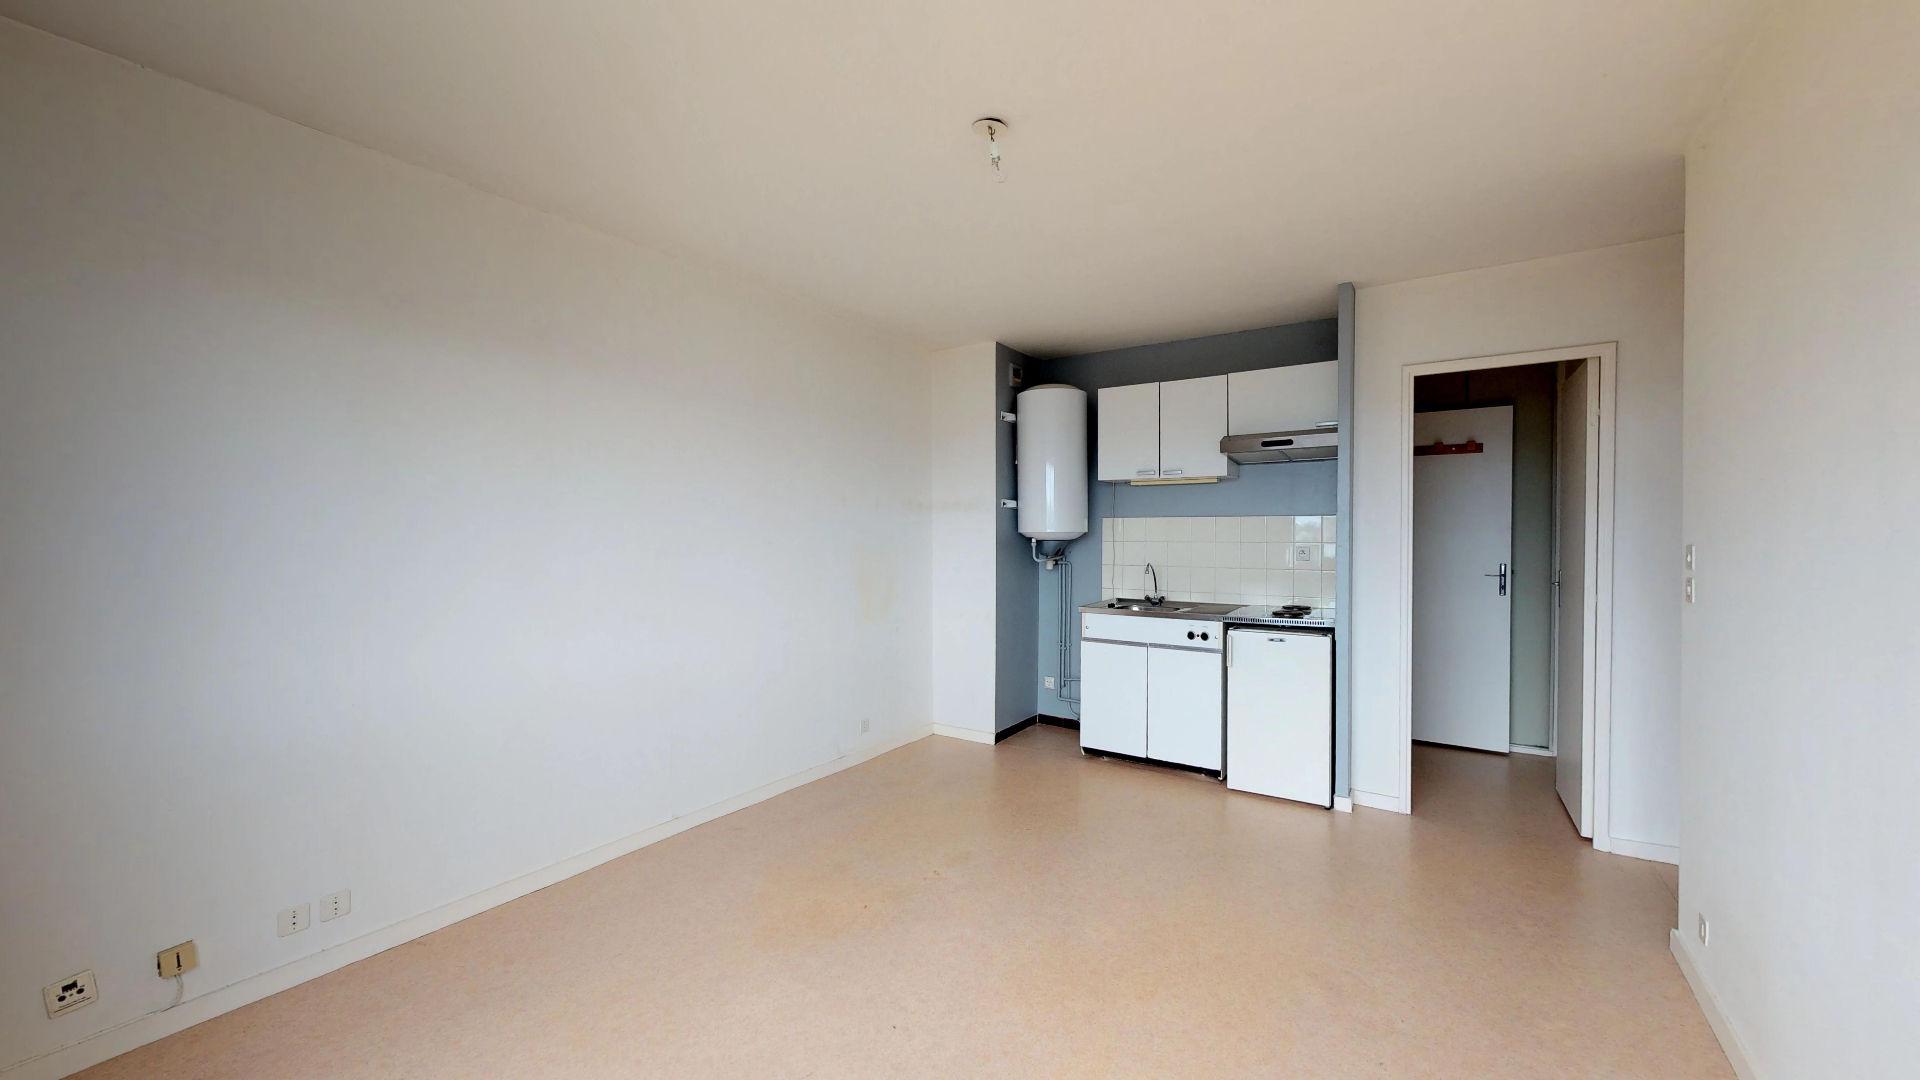 appartement 36m²  BESANÇON  - photo 2